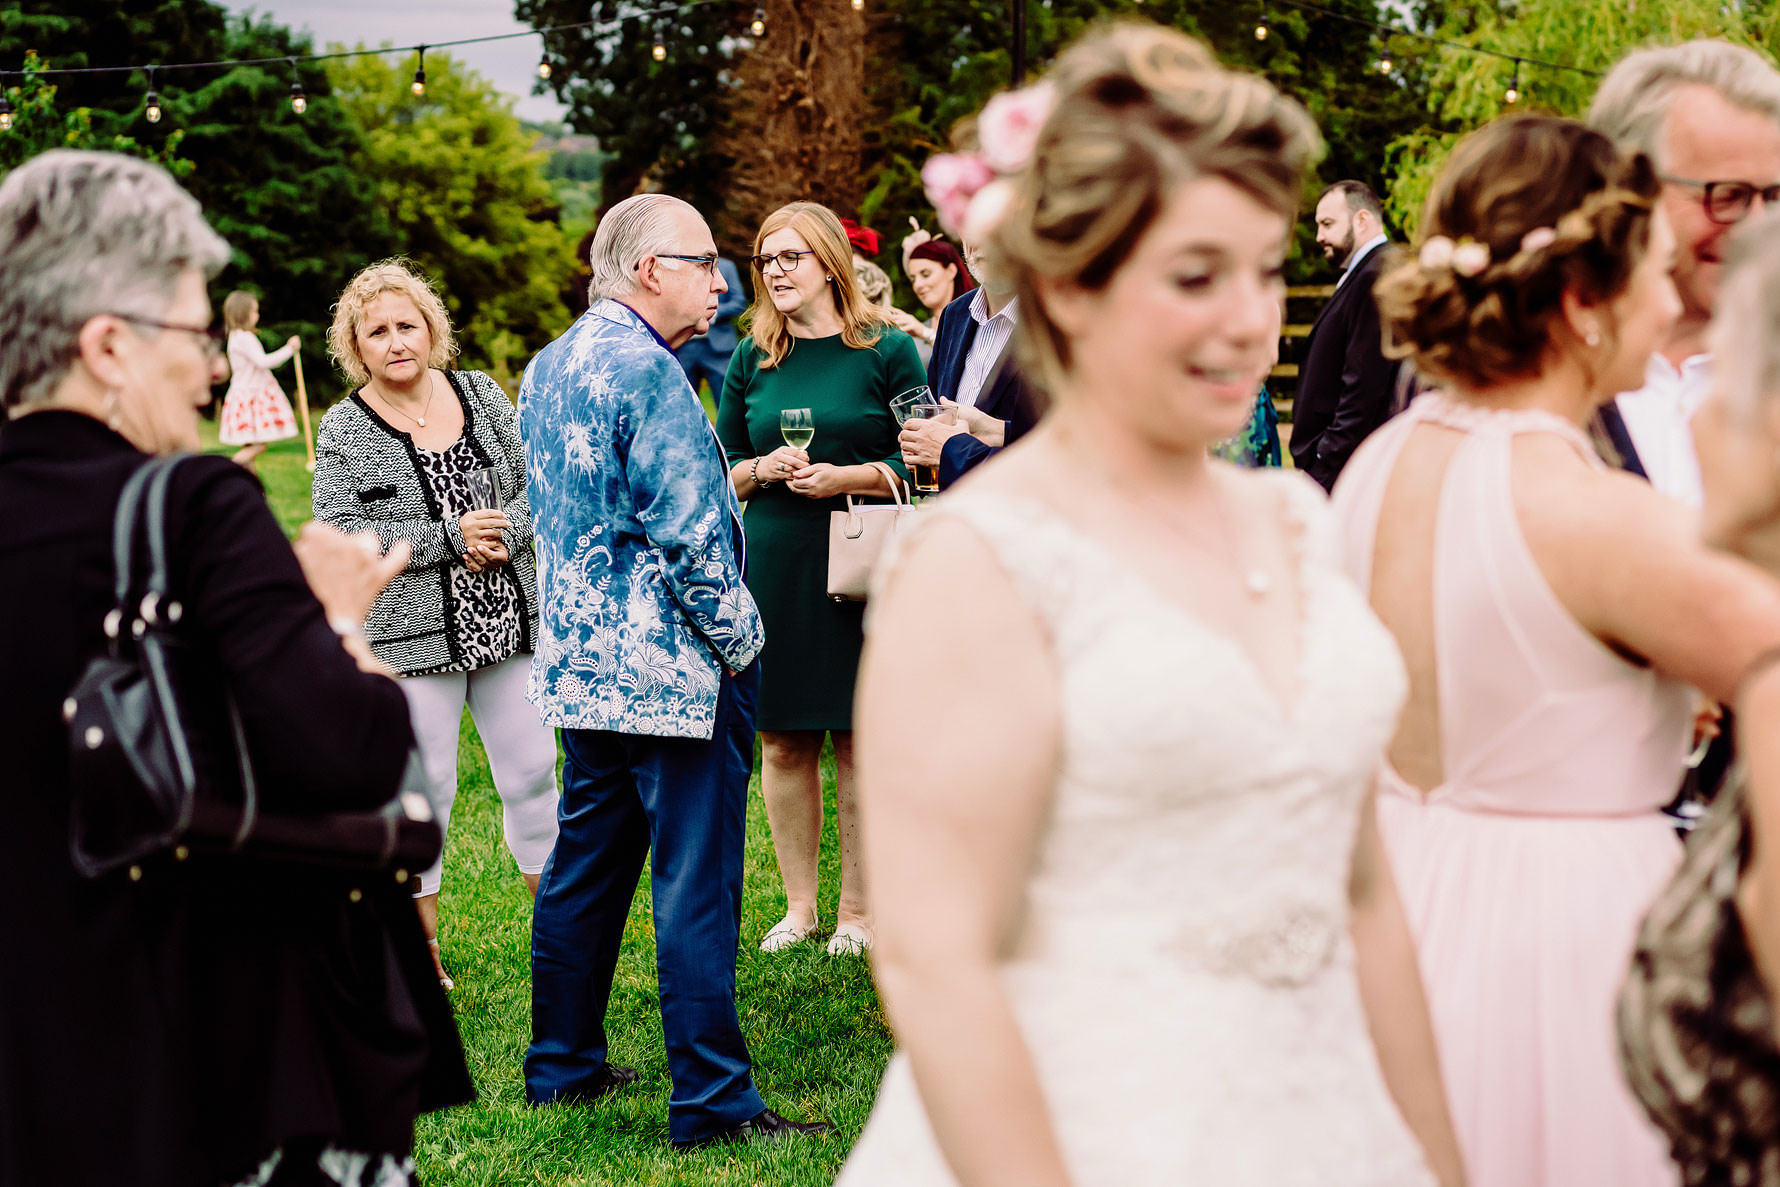 a wedding guest peeks at the wedding dress